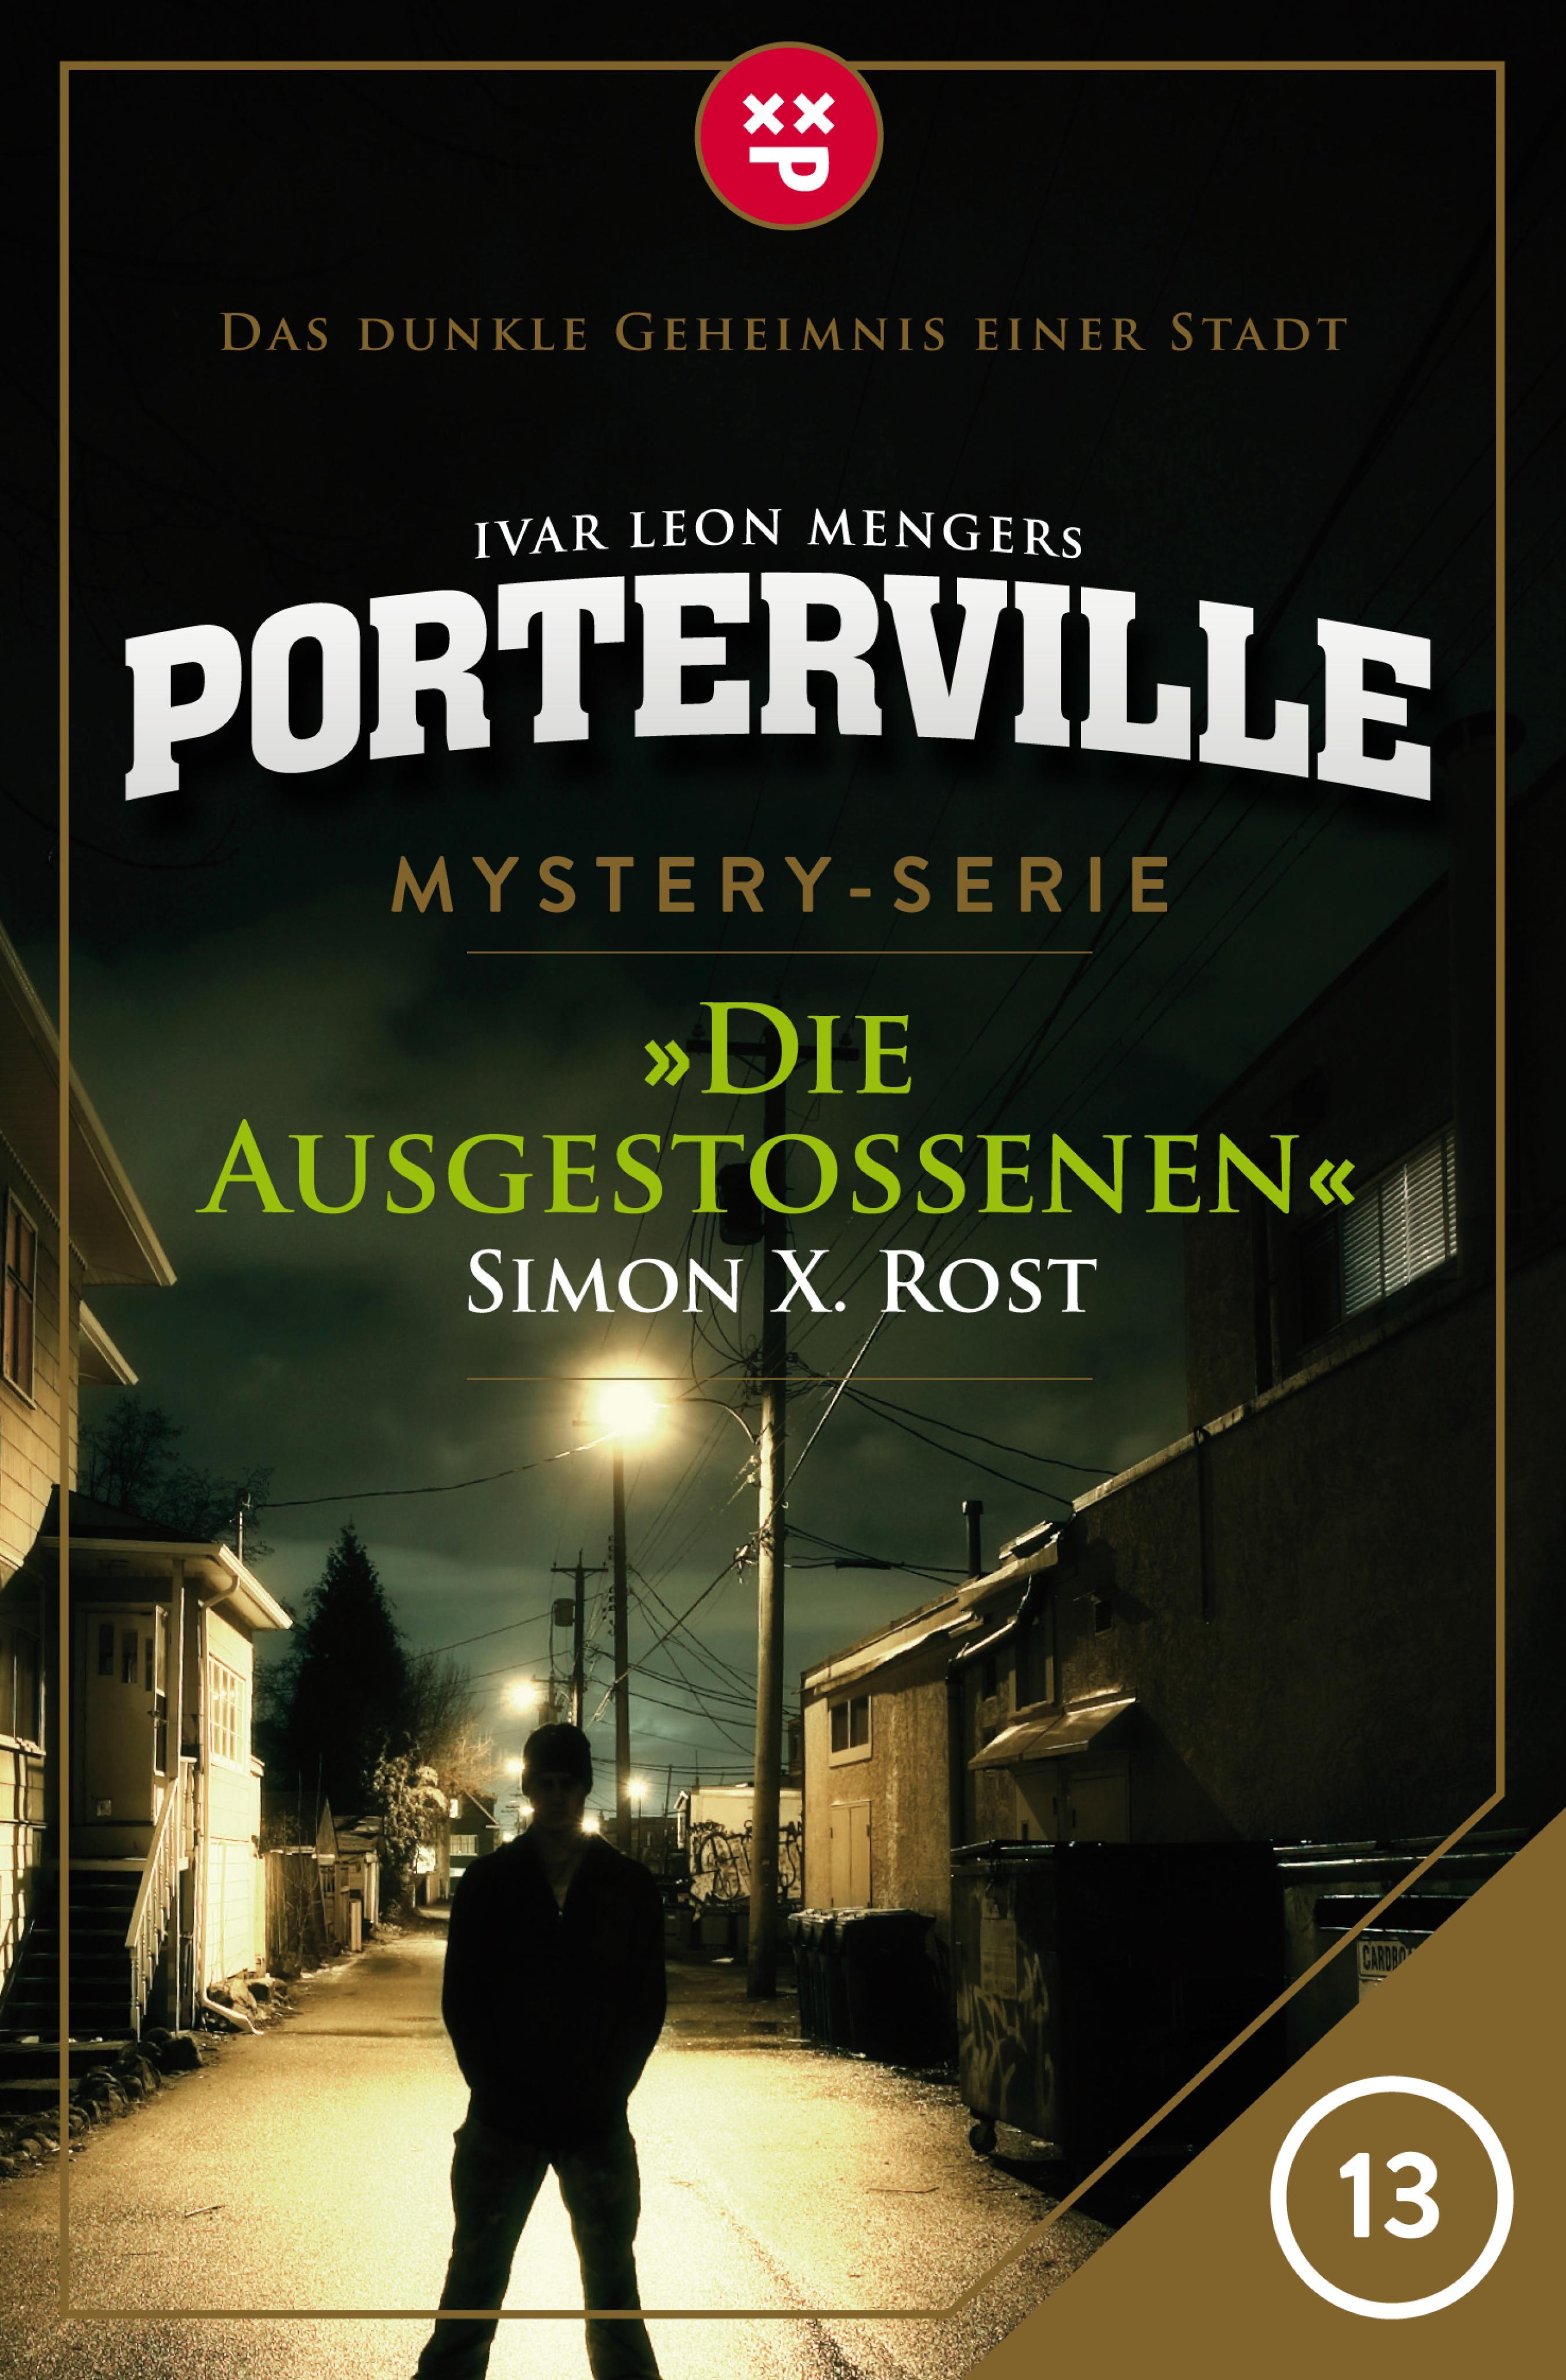 Simon X. Rost Porterville - Folge 13: Die Ausgestoßenen obzor kyrsa bitkoina otvesnyi rost 22 11 2017